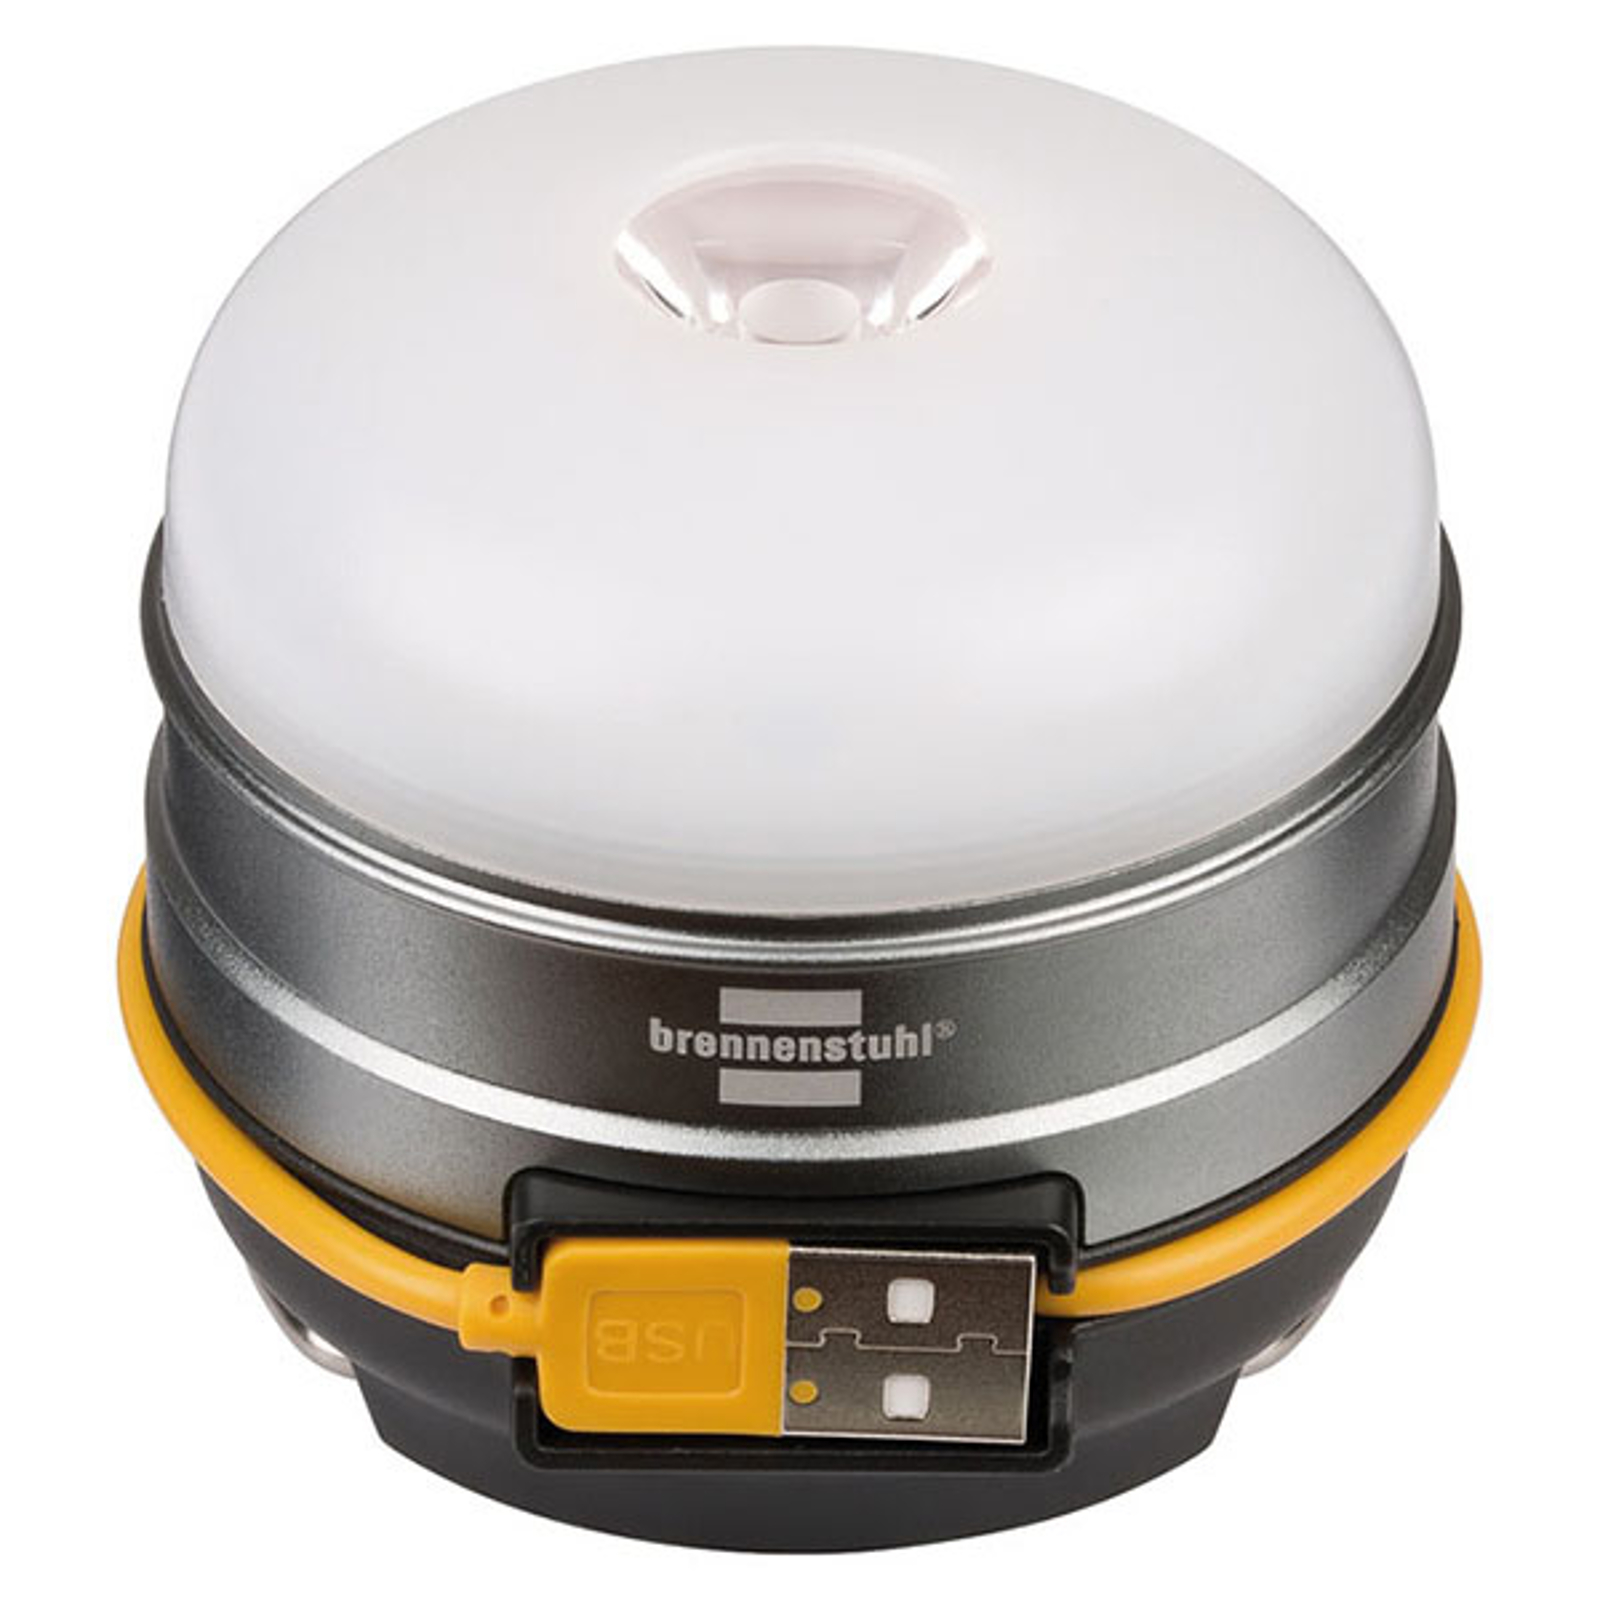 LED-batterilampa OLI 0300 A med powerbankfunktion